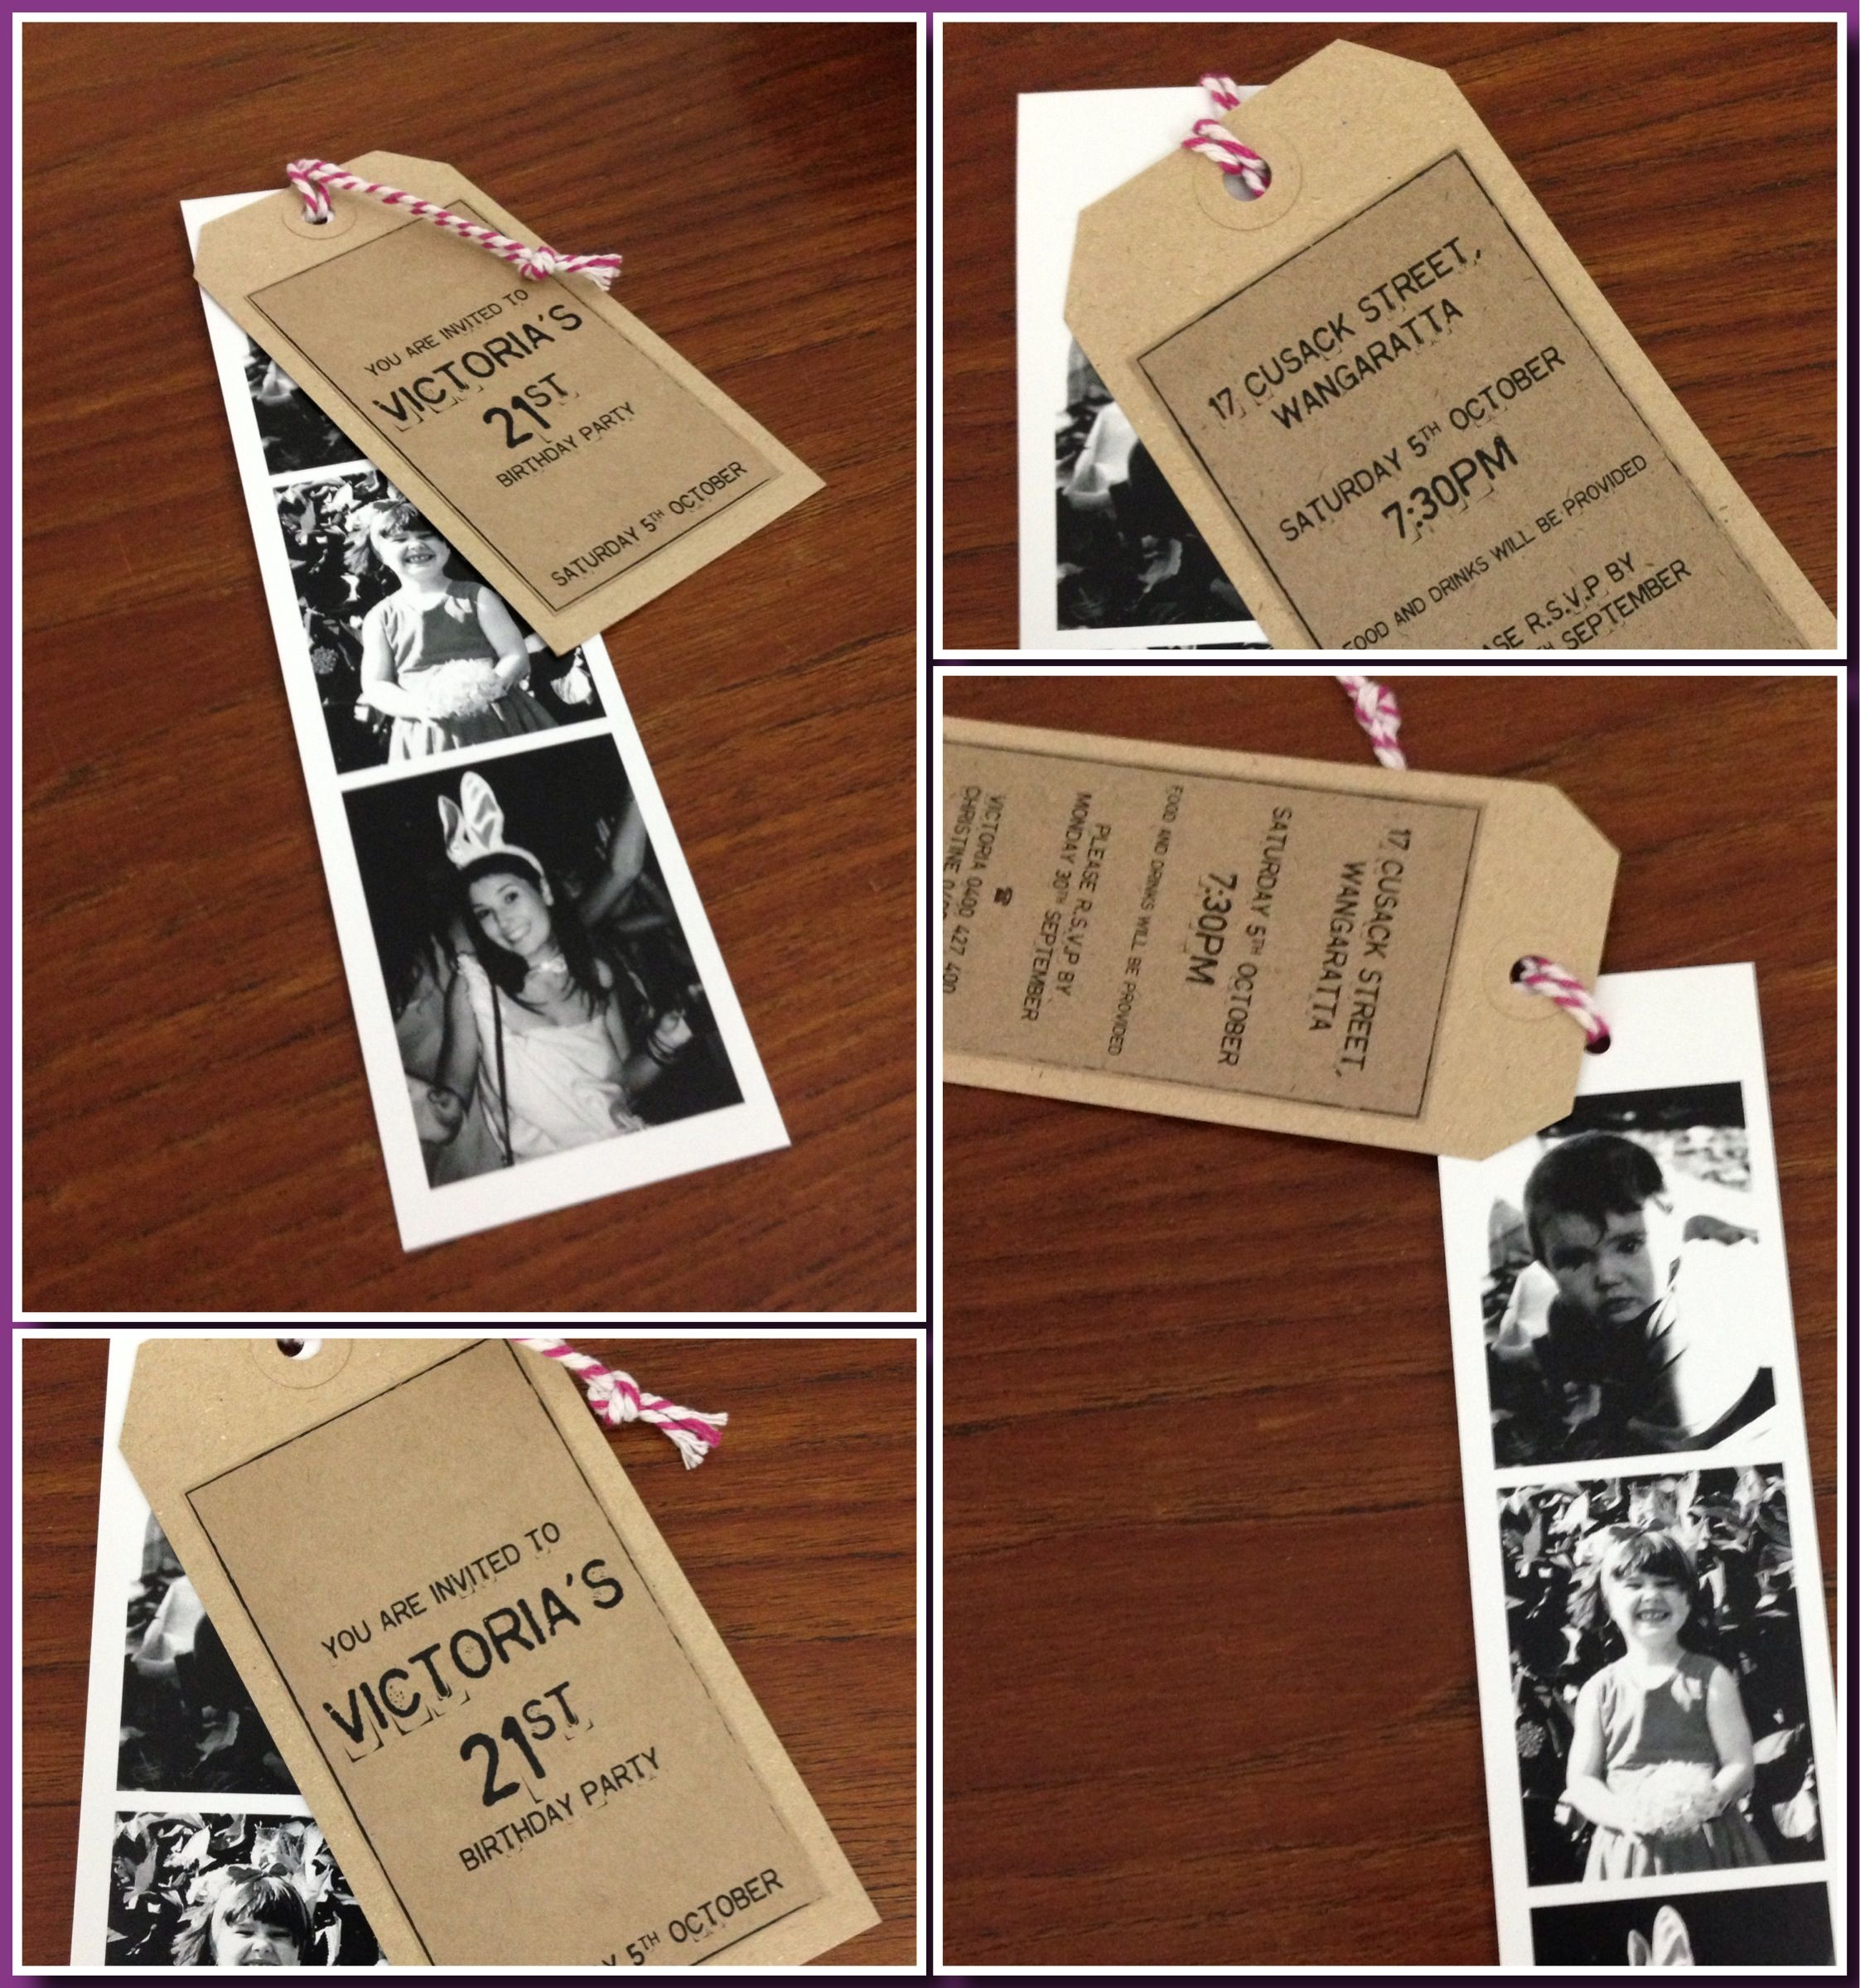 Pin Van Monalisa Jooste Op Invitations Verjaardag Uitnodigingen 21ste Verjaardag Verjaardagsfeestje Ideeen